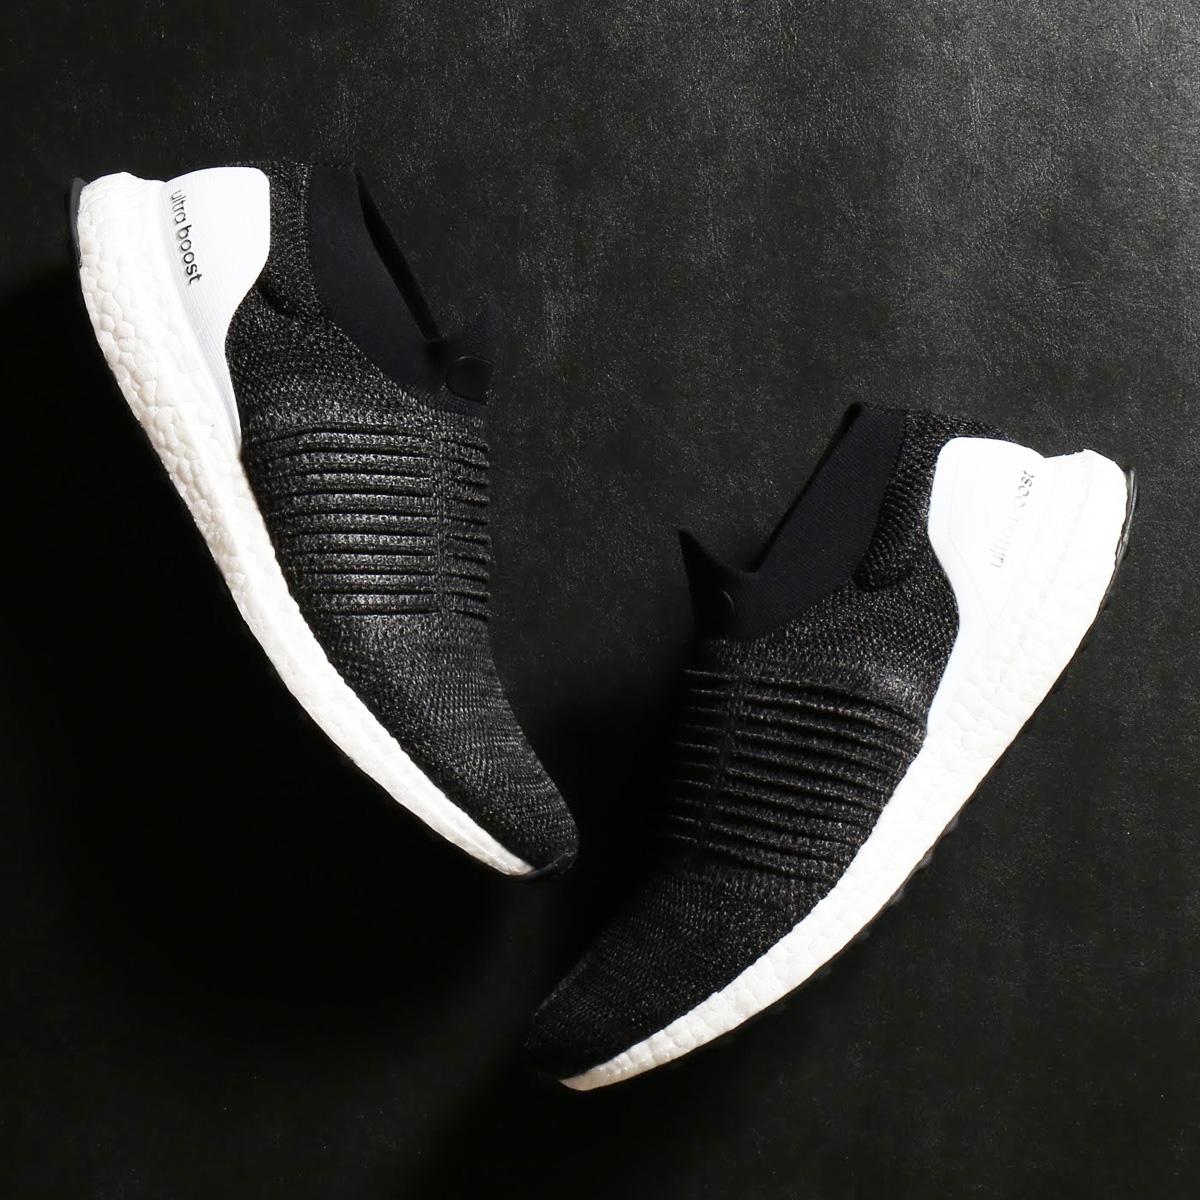 adidas UltraBOOST LACELESS (アディダス ウルトラブースト レースレス) Core Black/Core Black【メンズ スニーカー】18SS-S